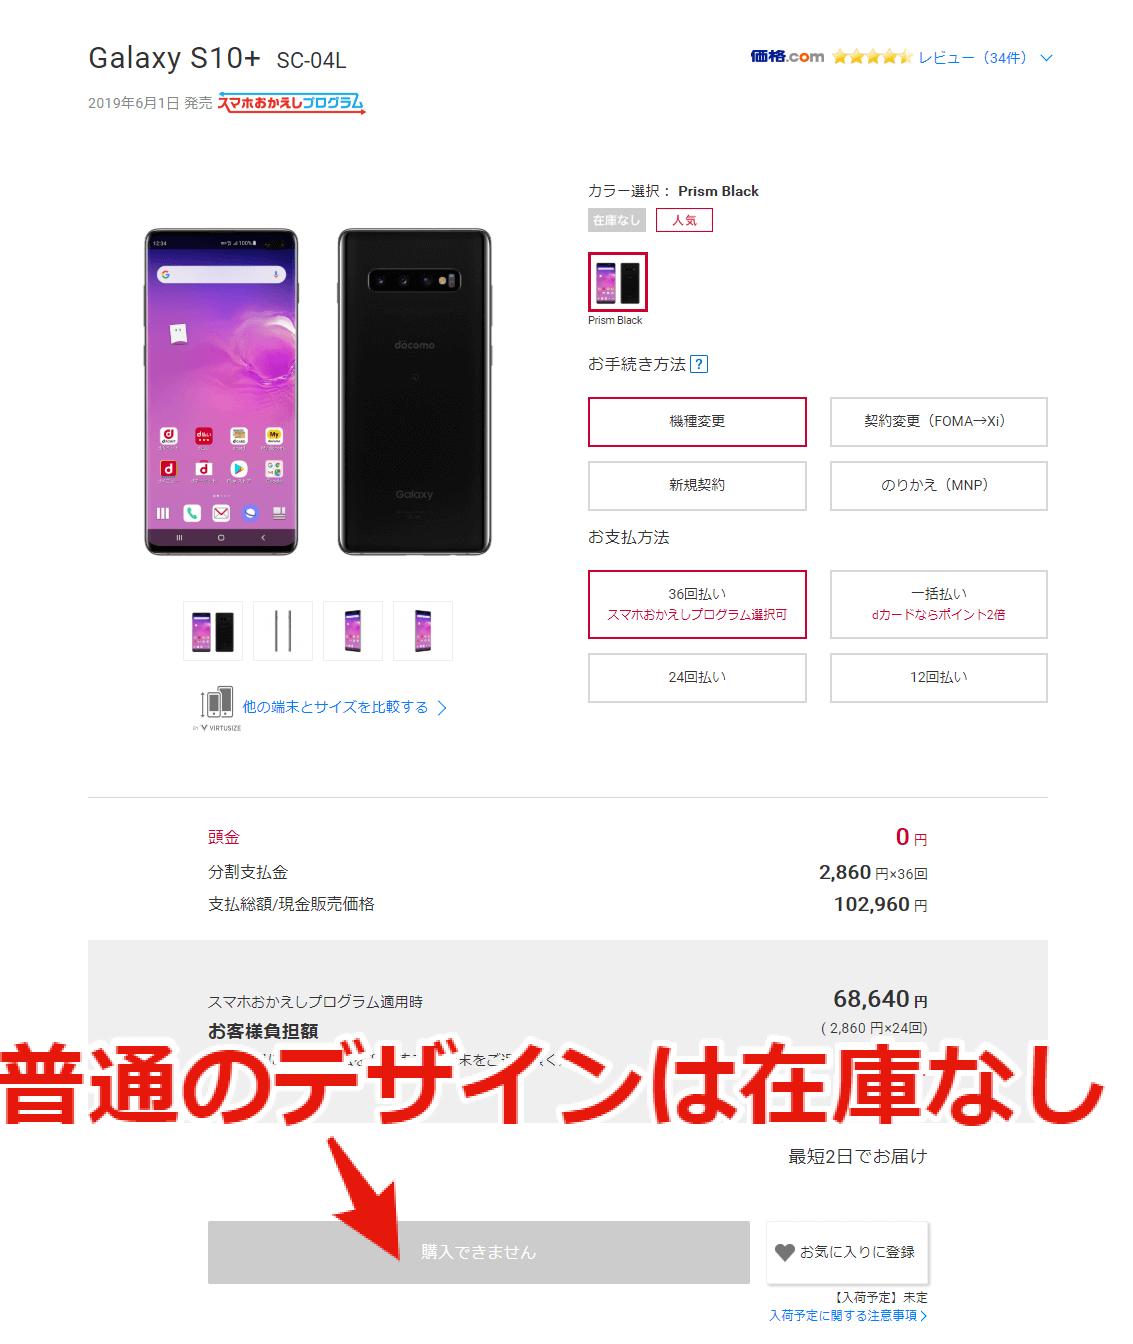 Galaxy S10+の通常カラーの在庫(ドコモ)